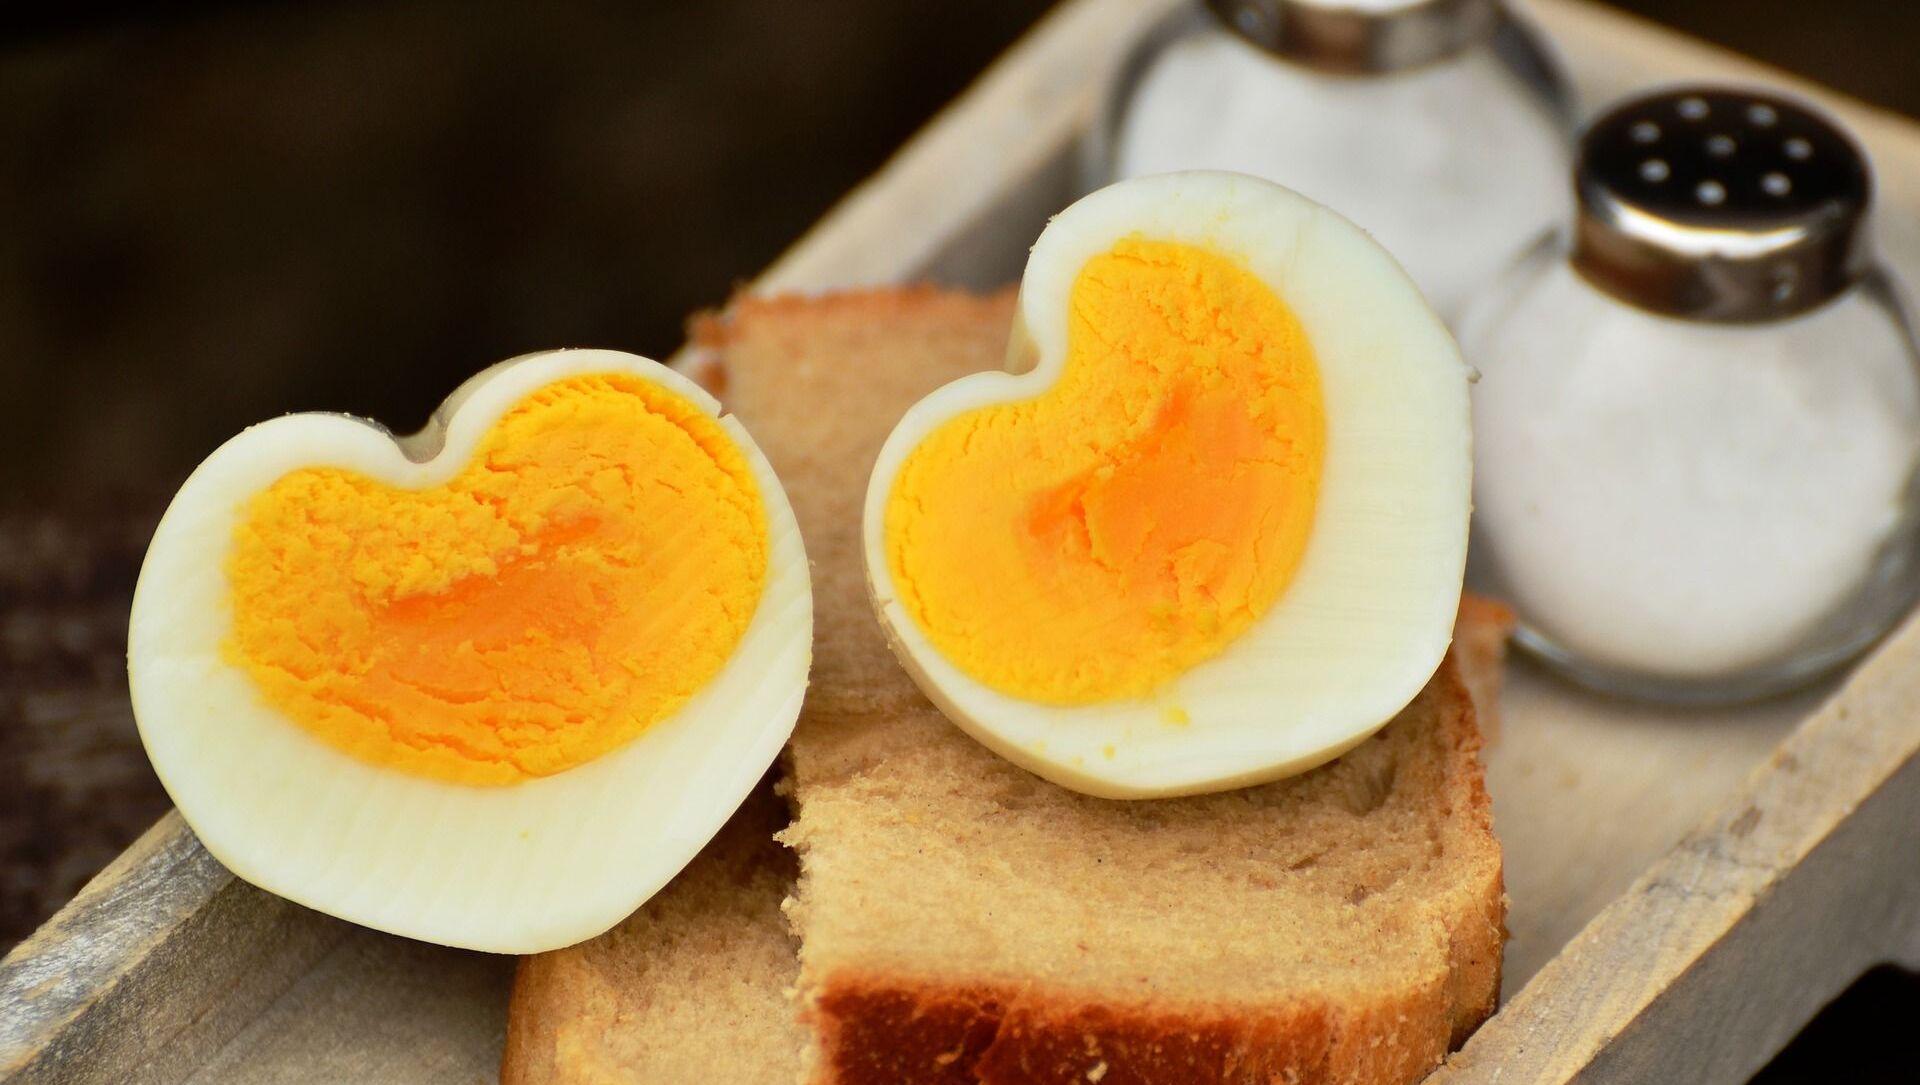 Вареное яйцо на хлебе - Sputnik Italia, 1920, 12.03.2021